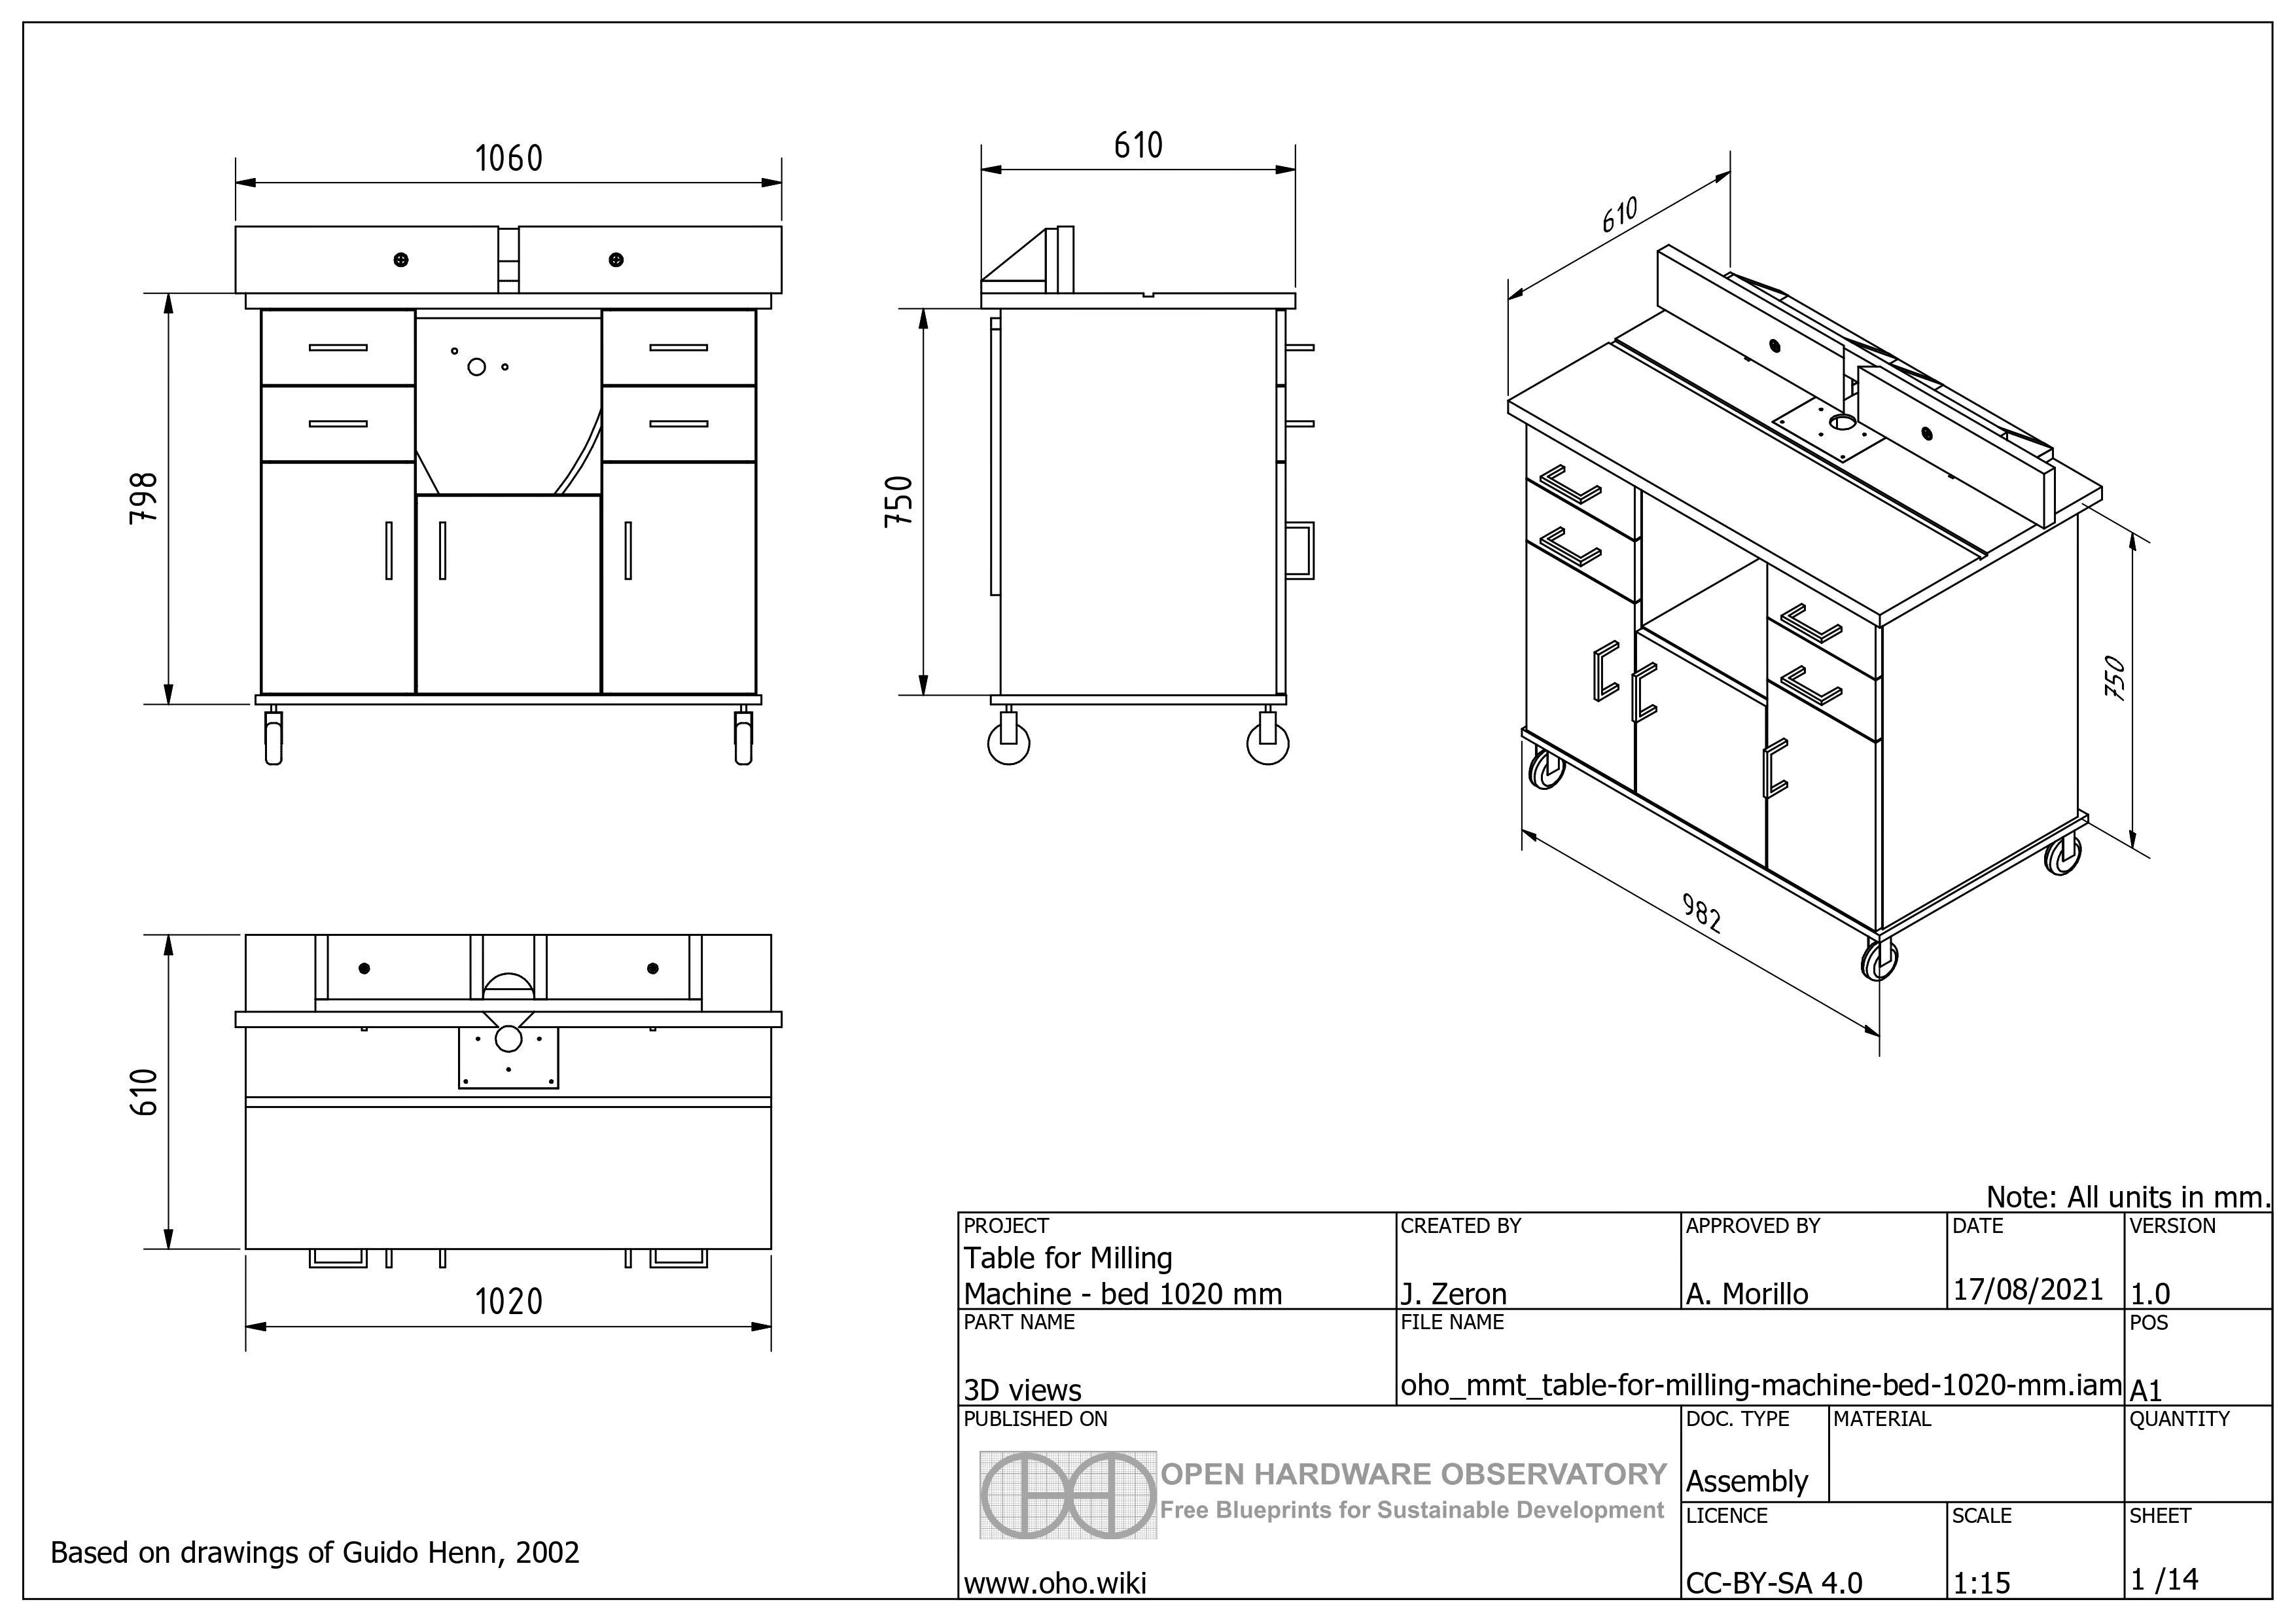 Oho mmt table-for-milling-machine-bed-1020-mm 0001.jpg